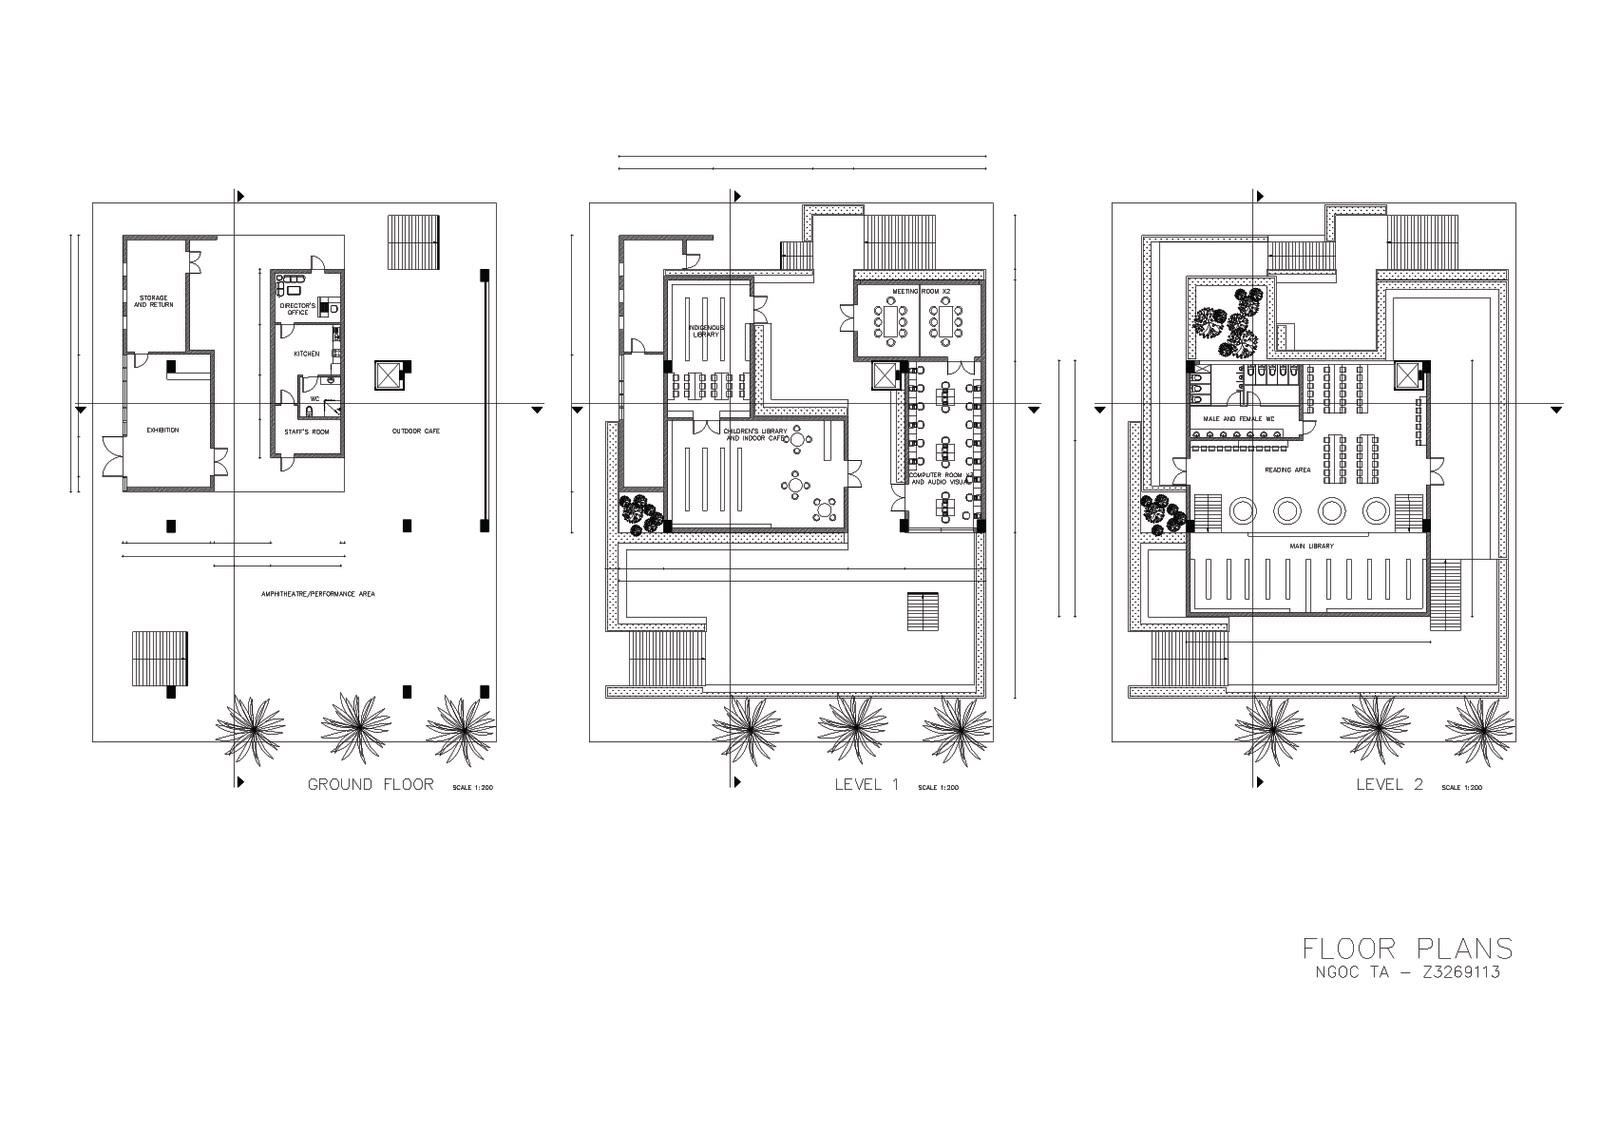 Elevation Plan Scale : Irene ngoc ta design studio assignment matraville